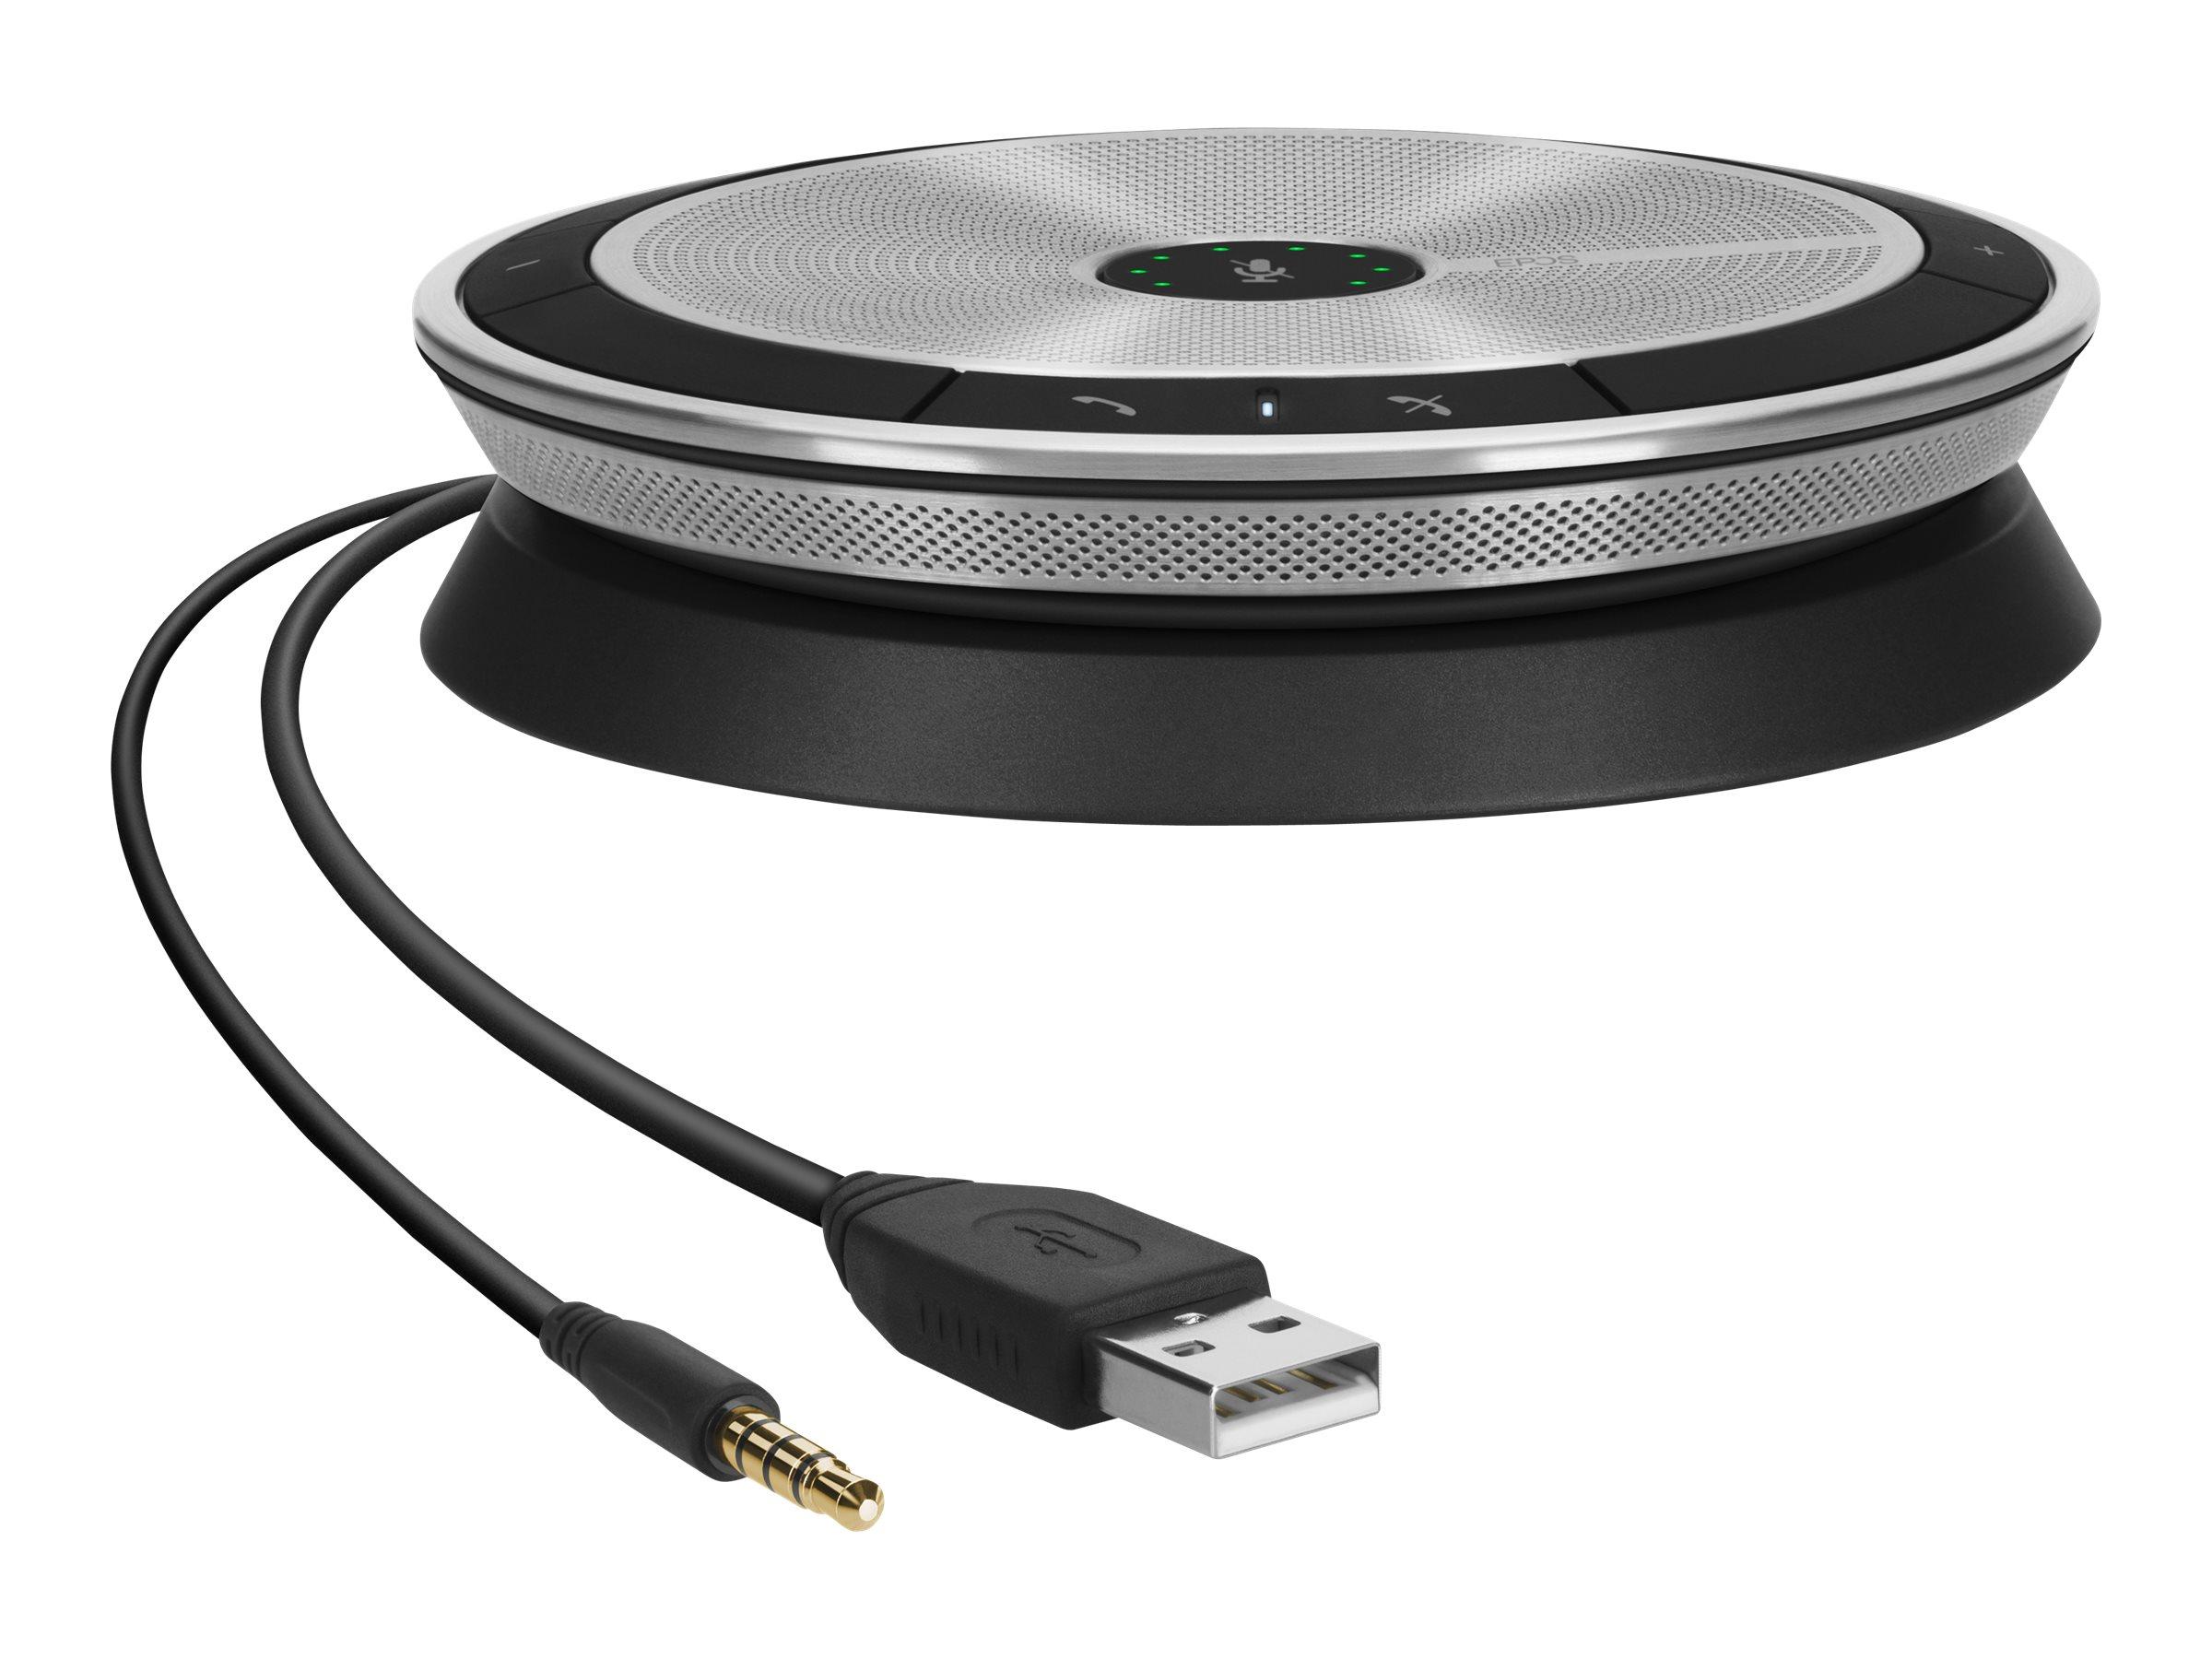 EPOS EXPAND SP 20 - speakerphone